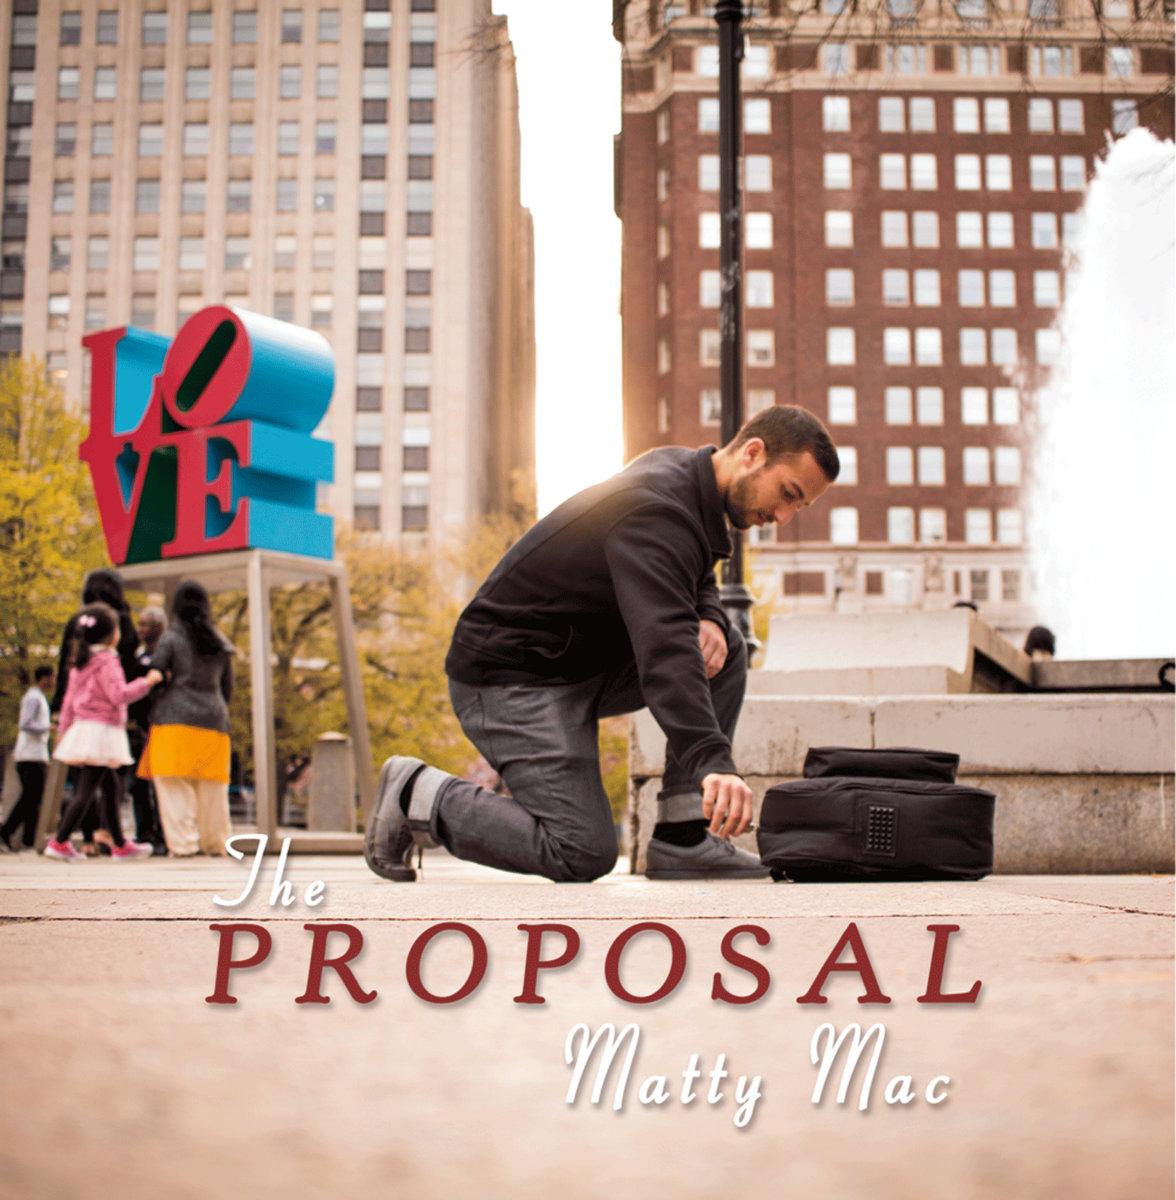 Matty Mac The Proposal Mp3 Download